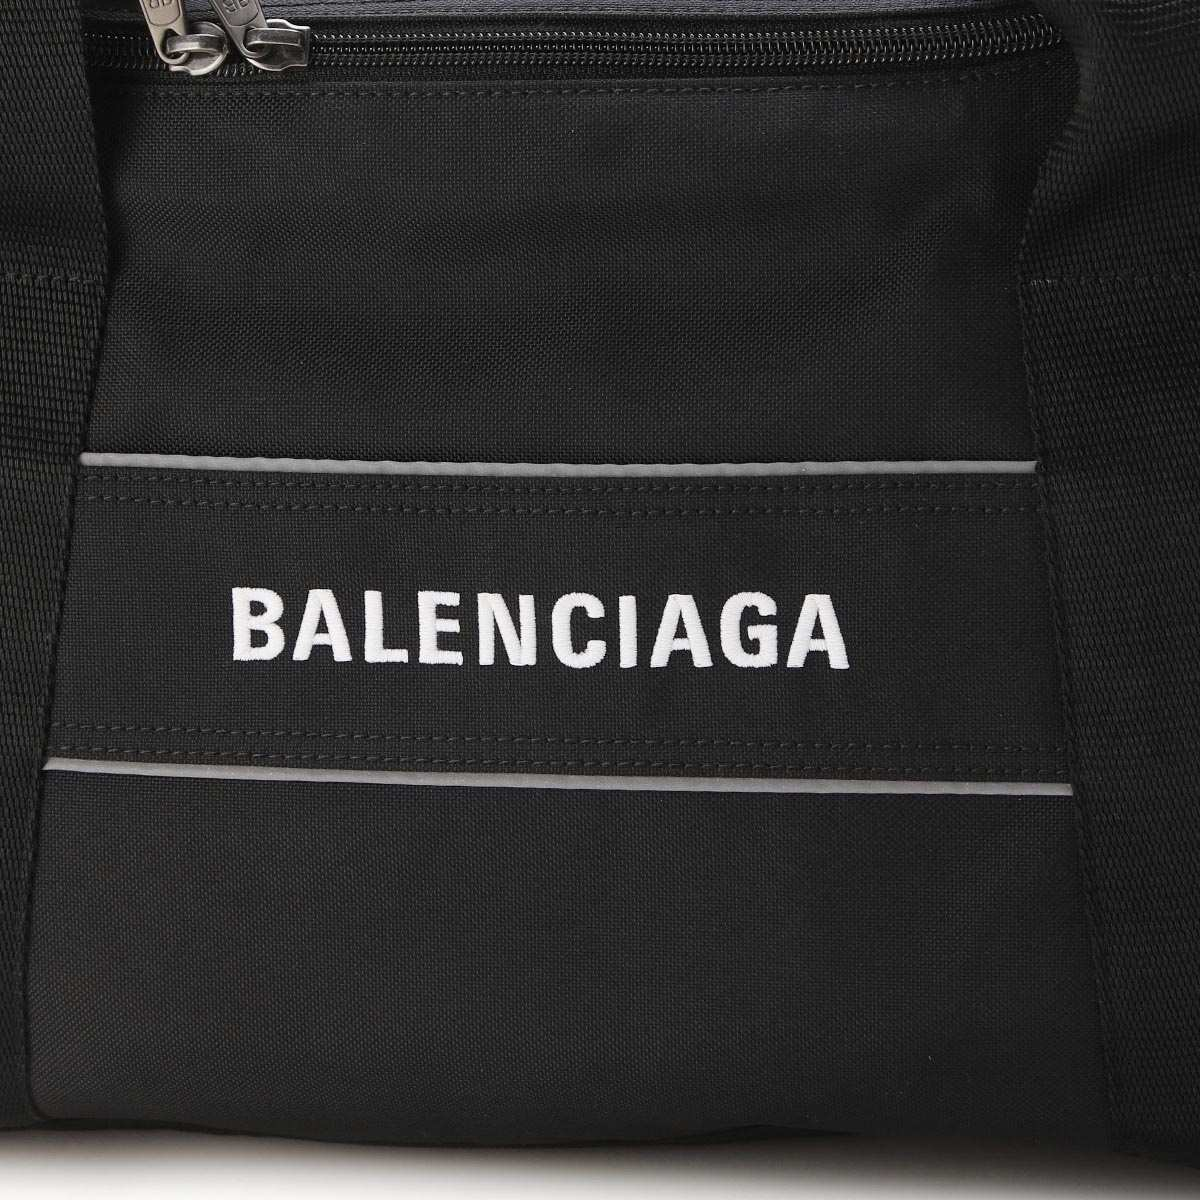 BALENCIAGA バレンシアガ ジムバッグ/ボストンバッグ/SPORT GYM BAG メンズ